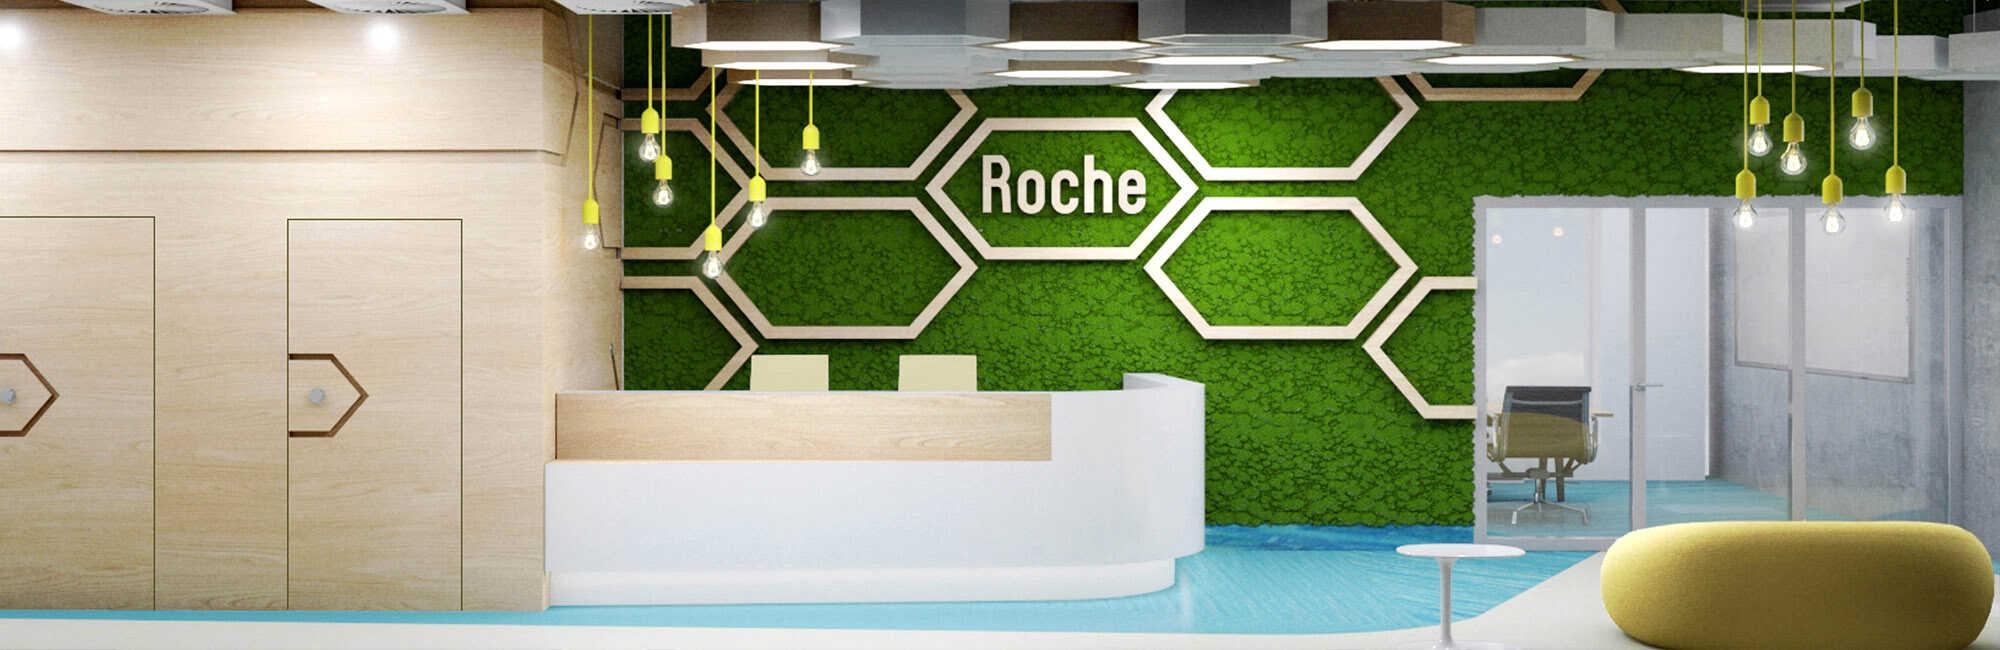 roche_slider